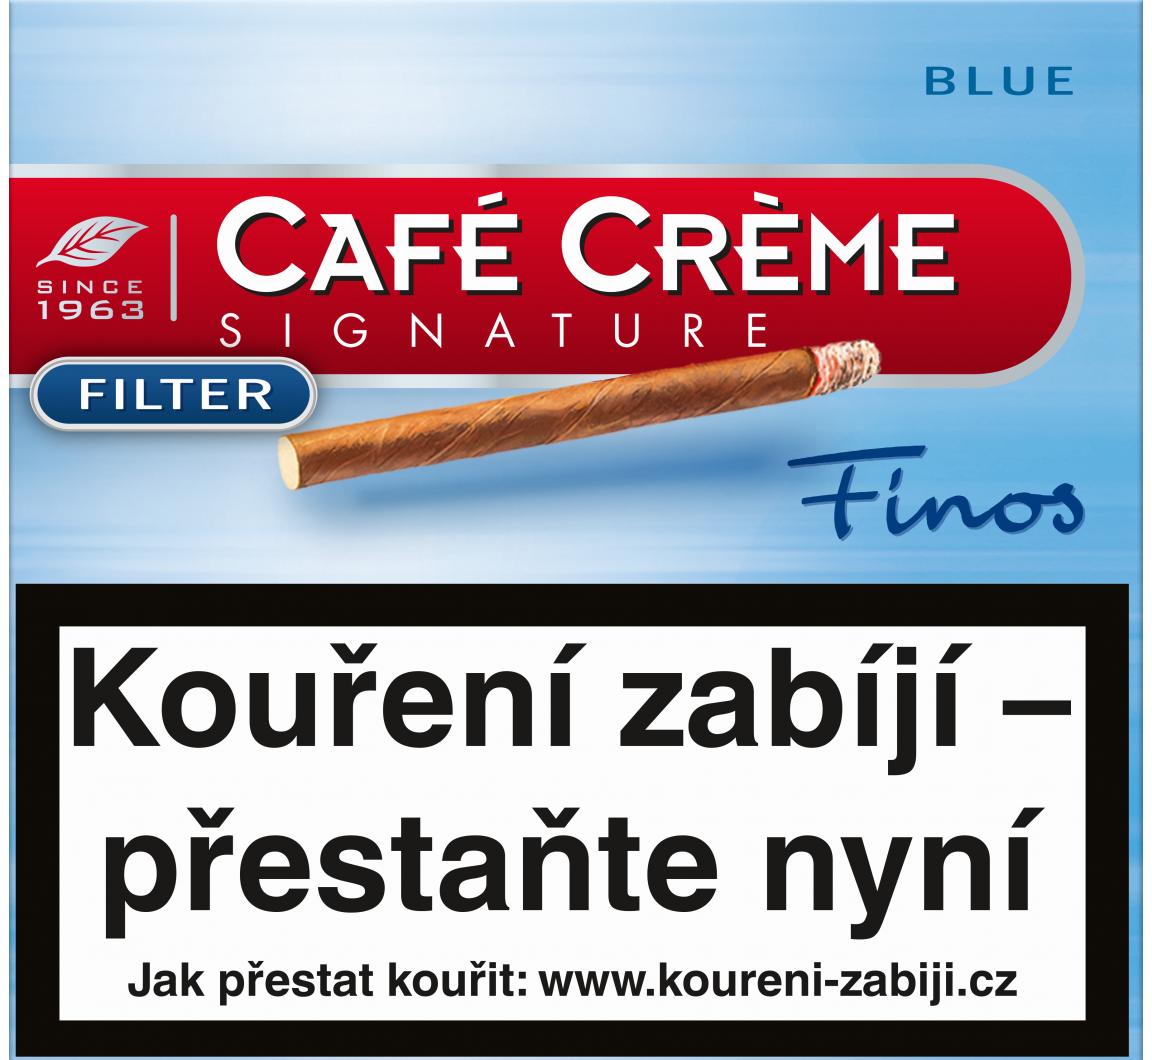 Cafe Creme Signature Finos Blue Flt 10ks